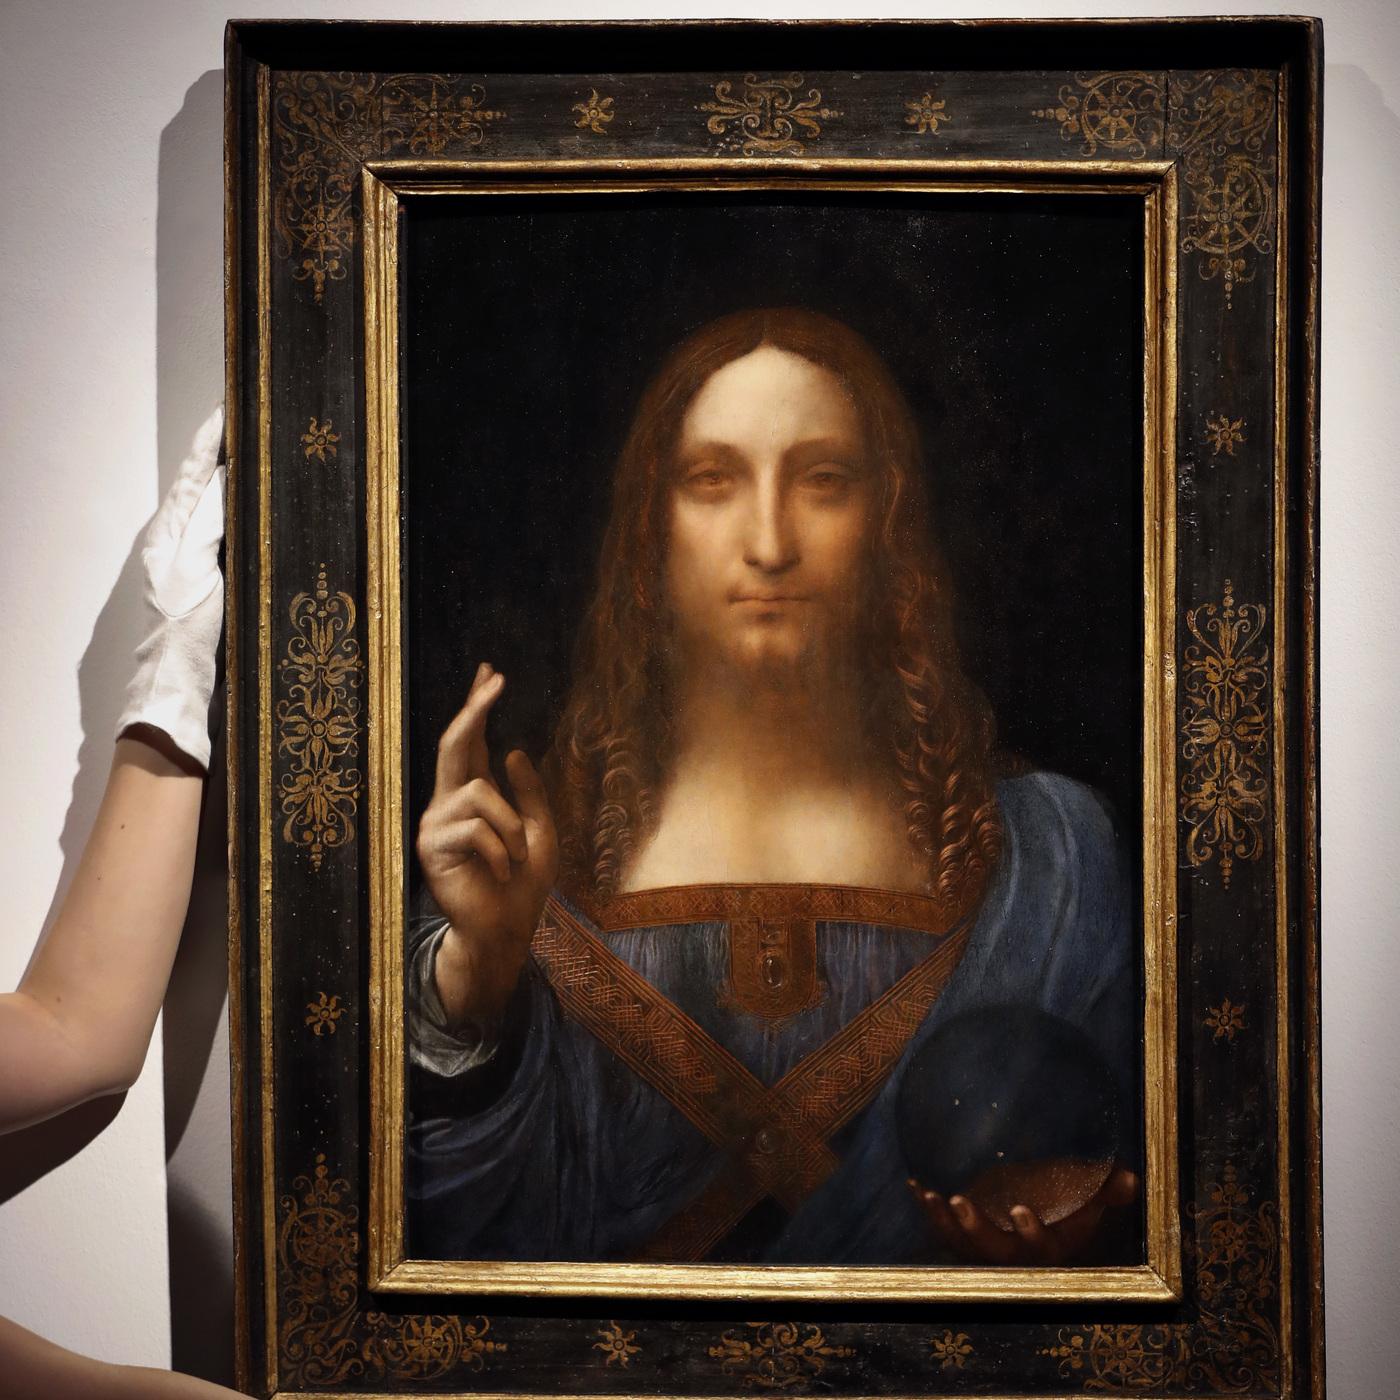 Leonardo Da Vinci Portrait Of Christ Sells For Record